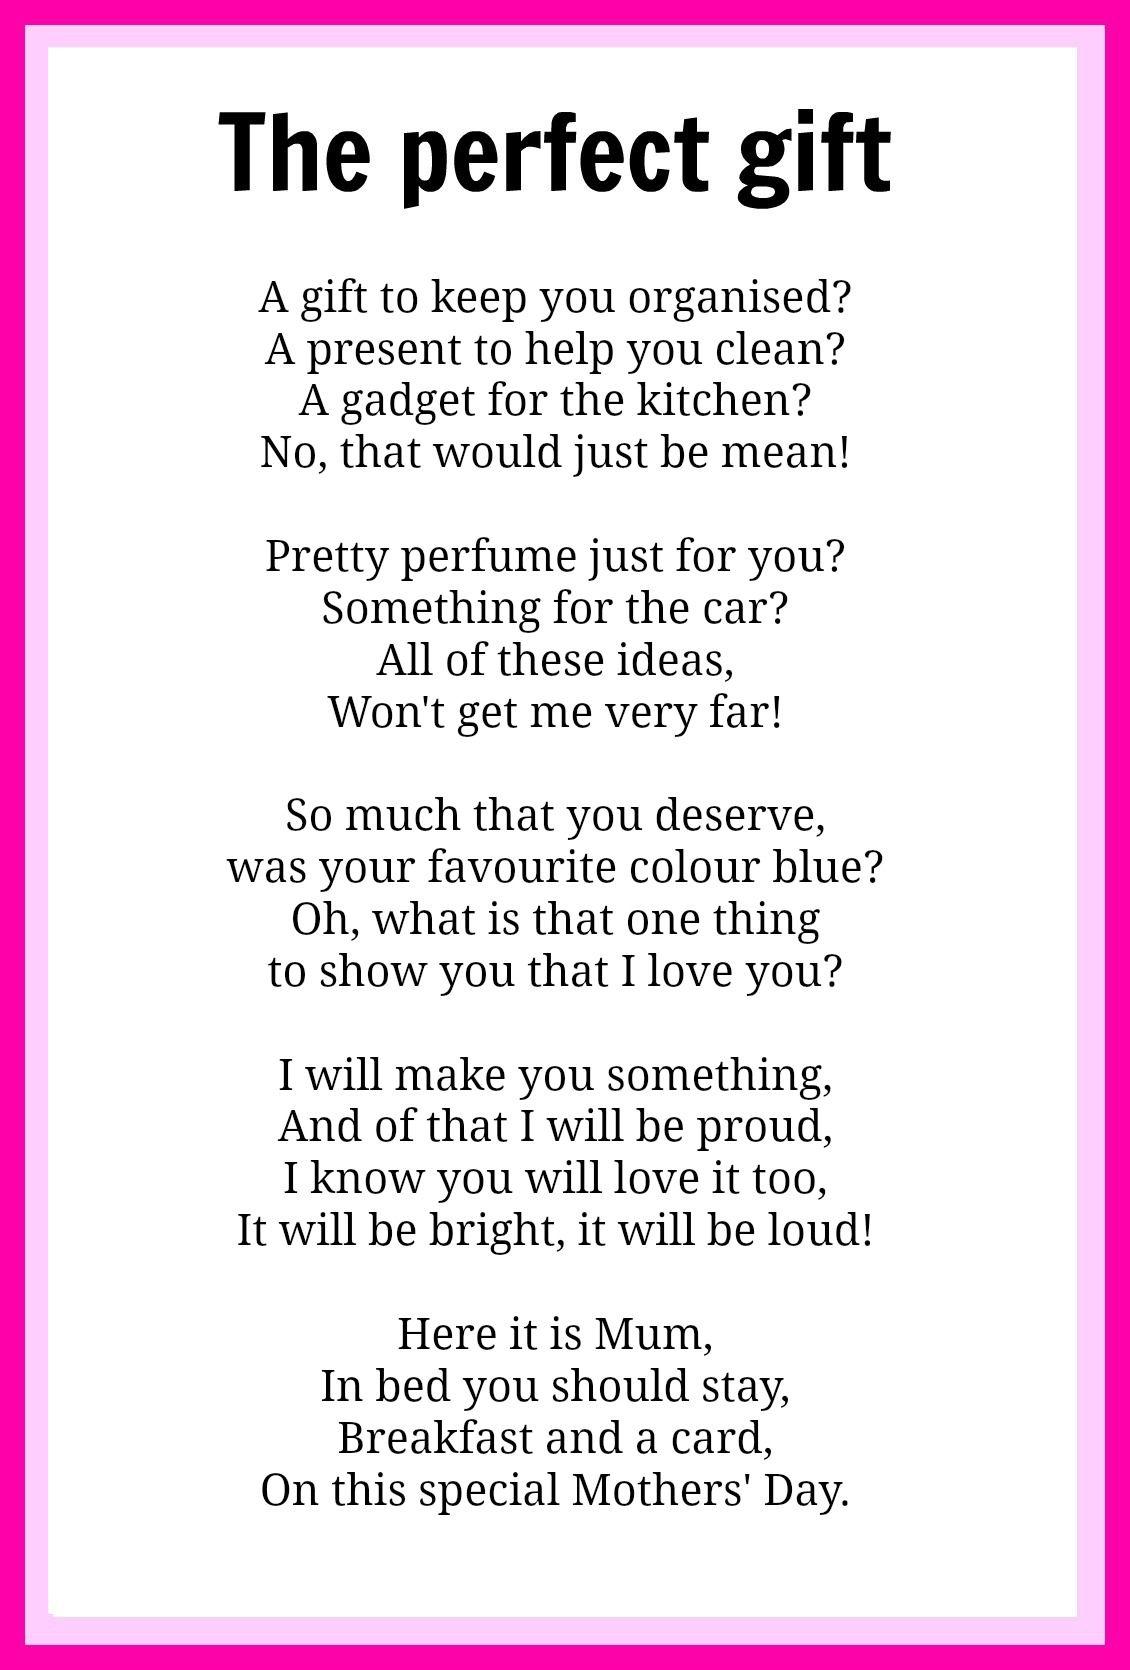 Print This Poem Print This Poem